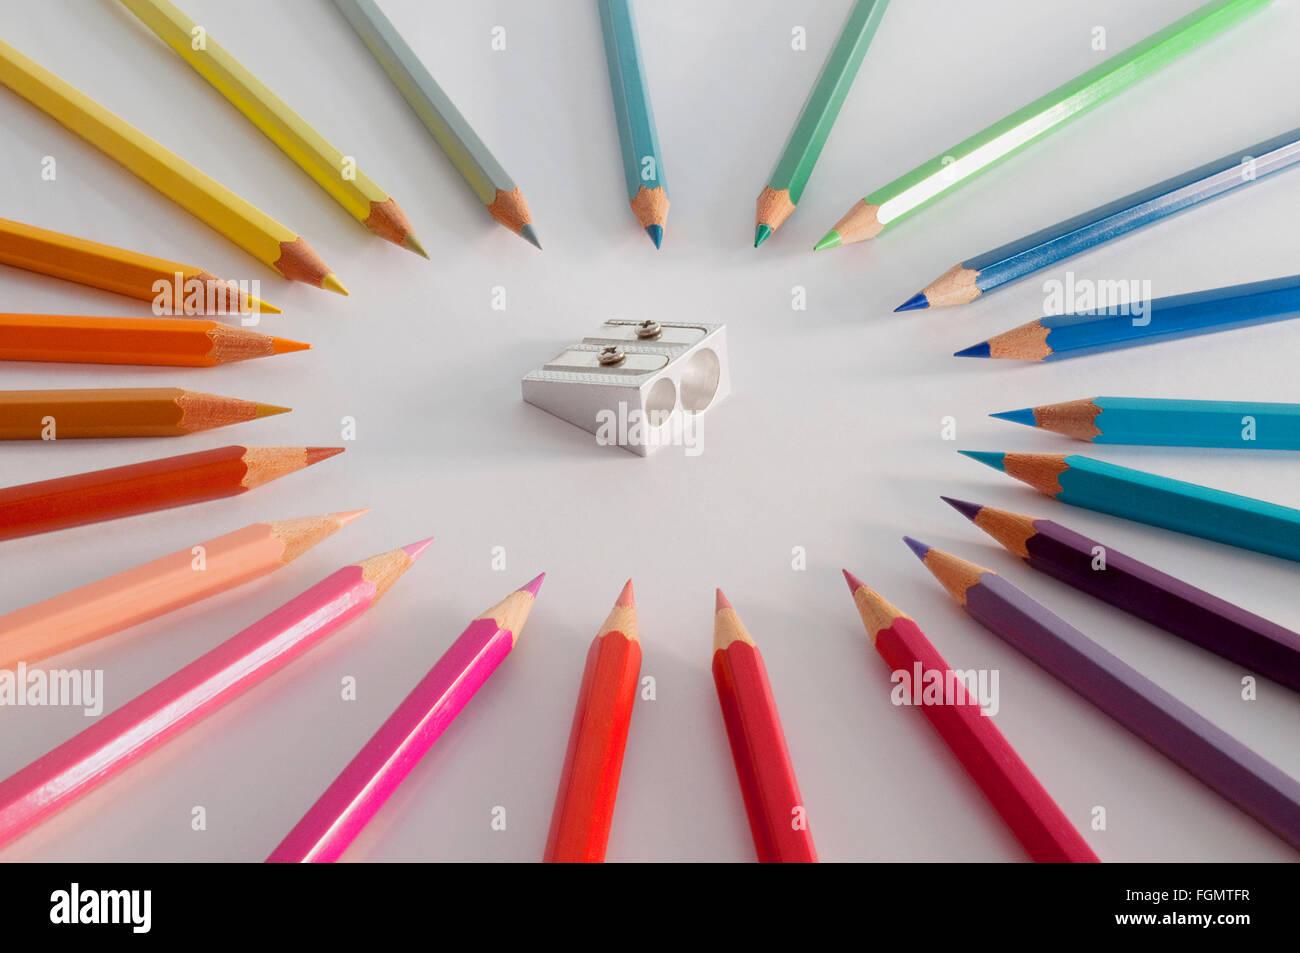 Colored pencils surrounding menacingly a pencil sharpener. - Stock Image